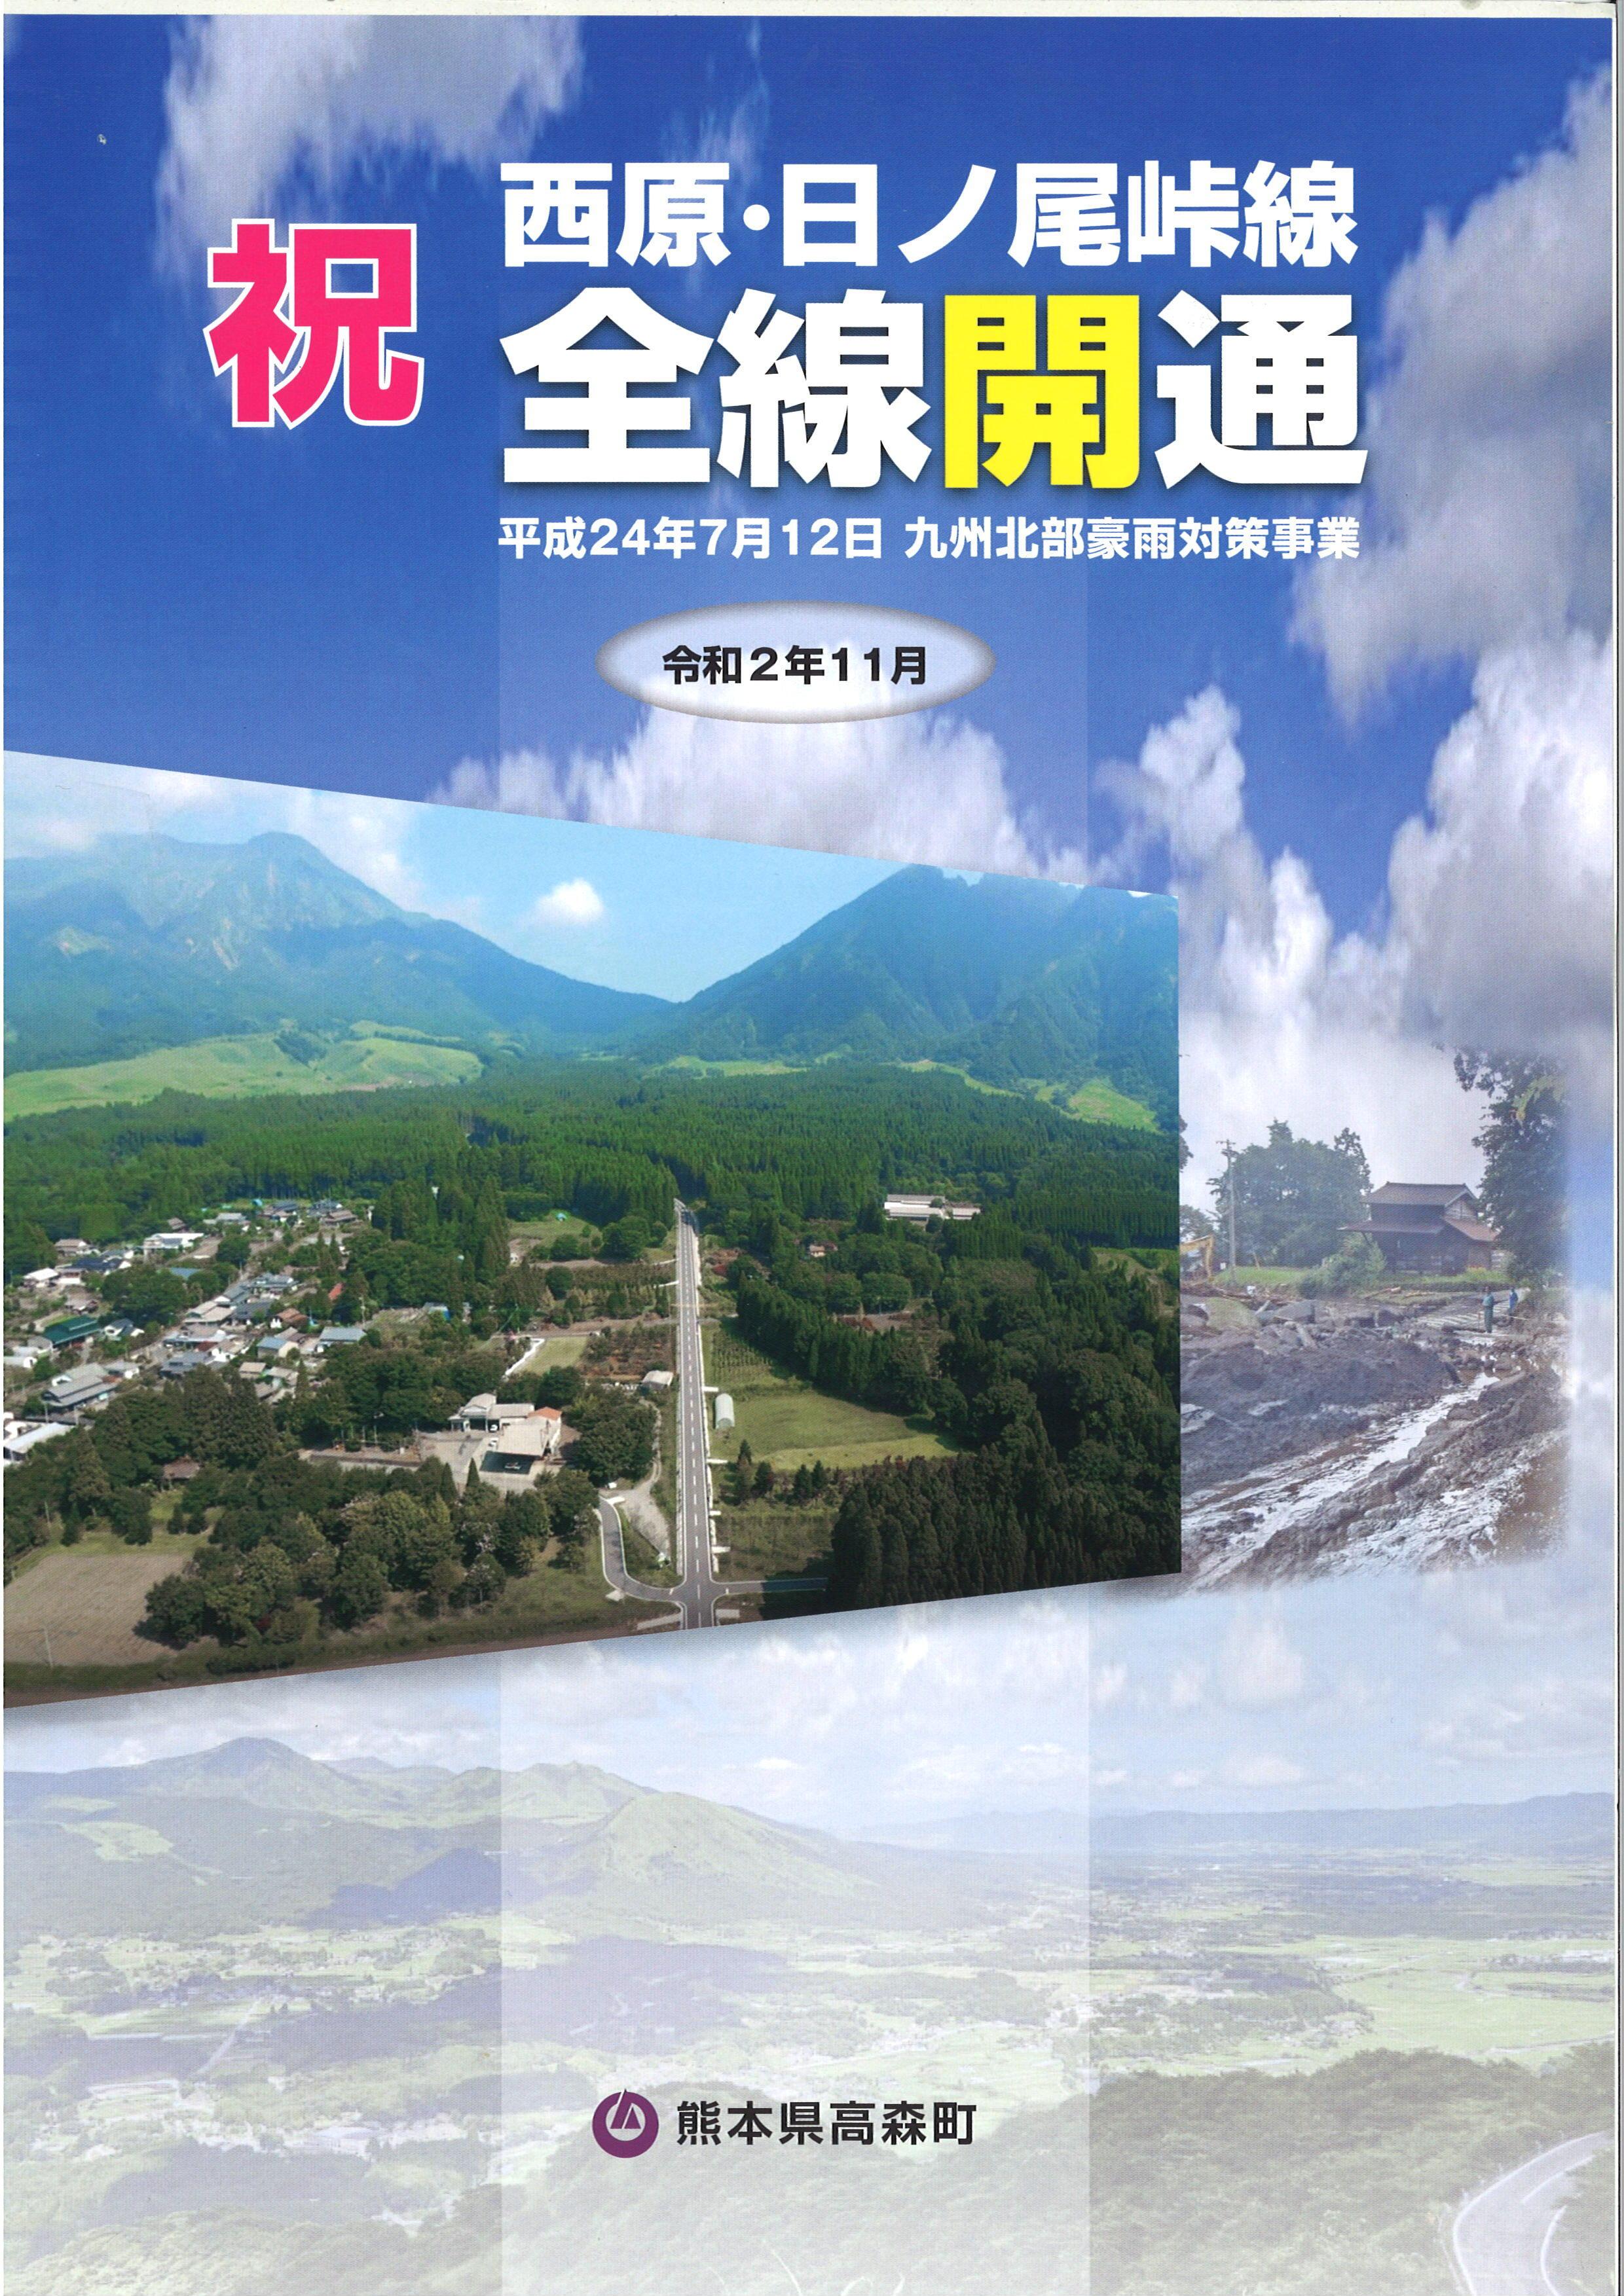 http://www.town.takamori.kumamoto.jp/chosha/somu/upload/e6aee149ca71106486b6bfdc9f1d859cb8fd24c6.jpg